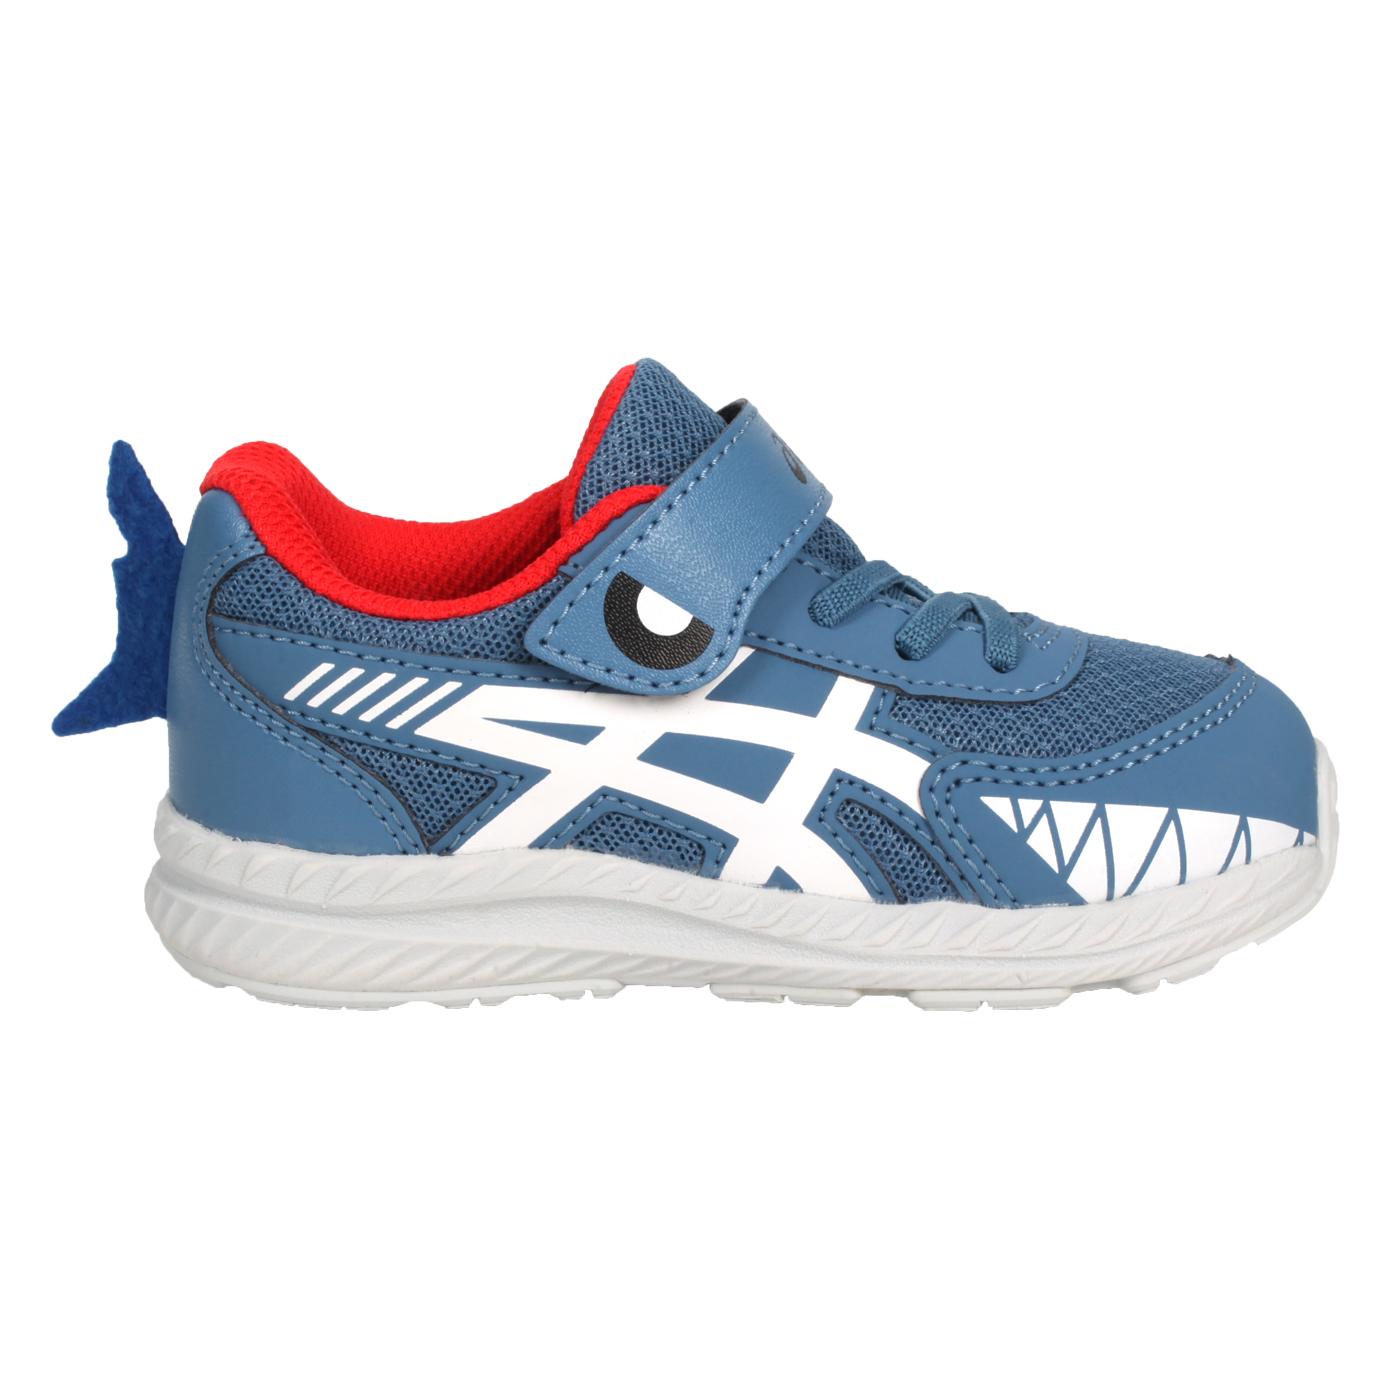 ASICS 小童慢跑鞋  @CONTEND 7 TS SCHOOL YARD@1014A202-404 - 墨藍白